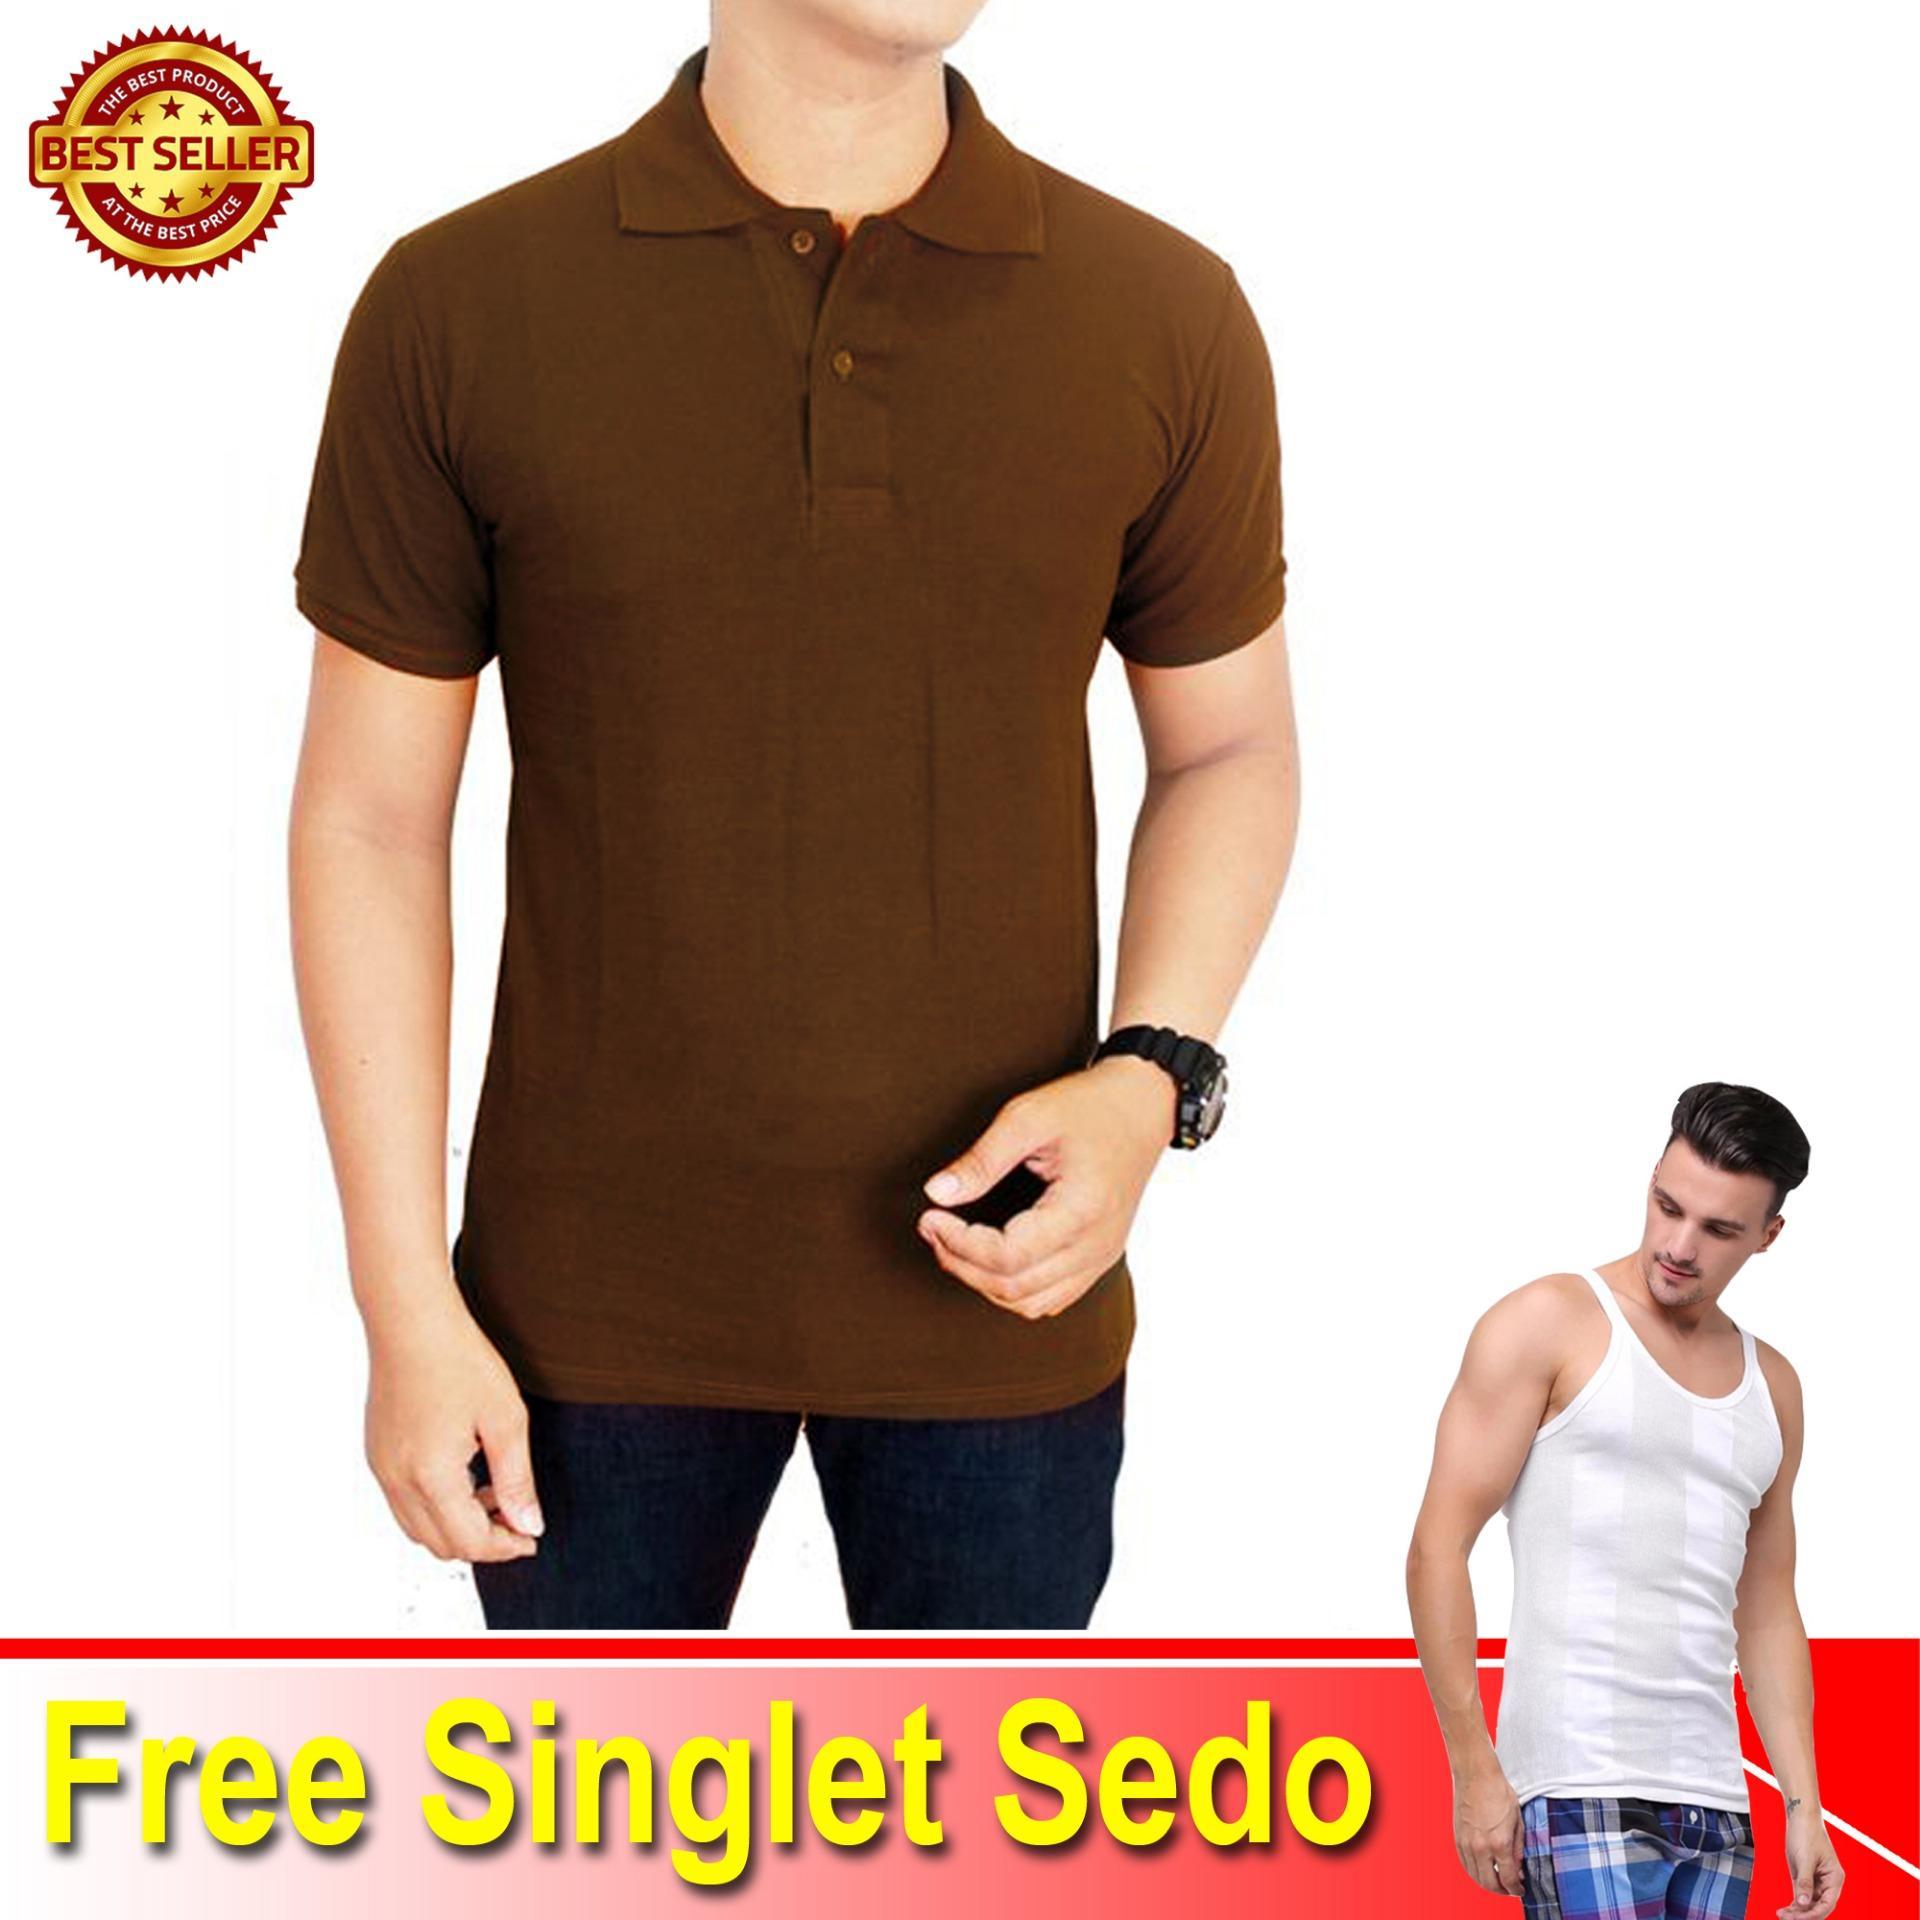 Baju Kaos Kerah Coklat Tua SJ66 Polo Lacoste Free 1 Singlet Sedo - Makario Maju